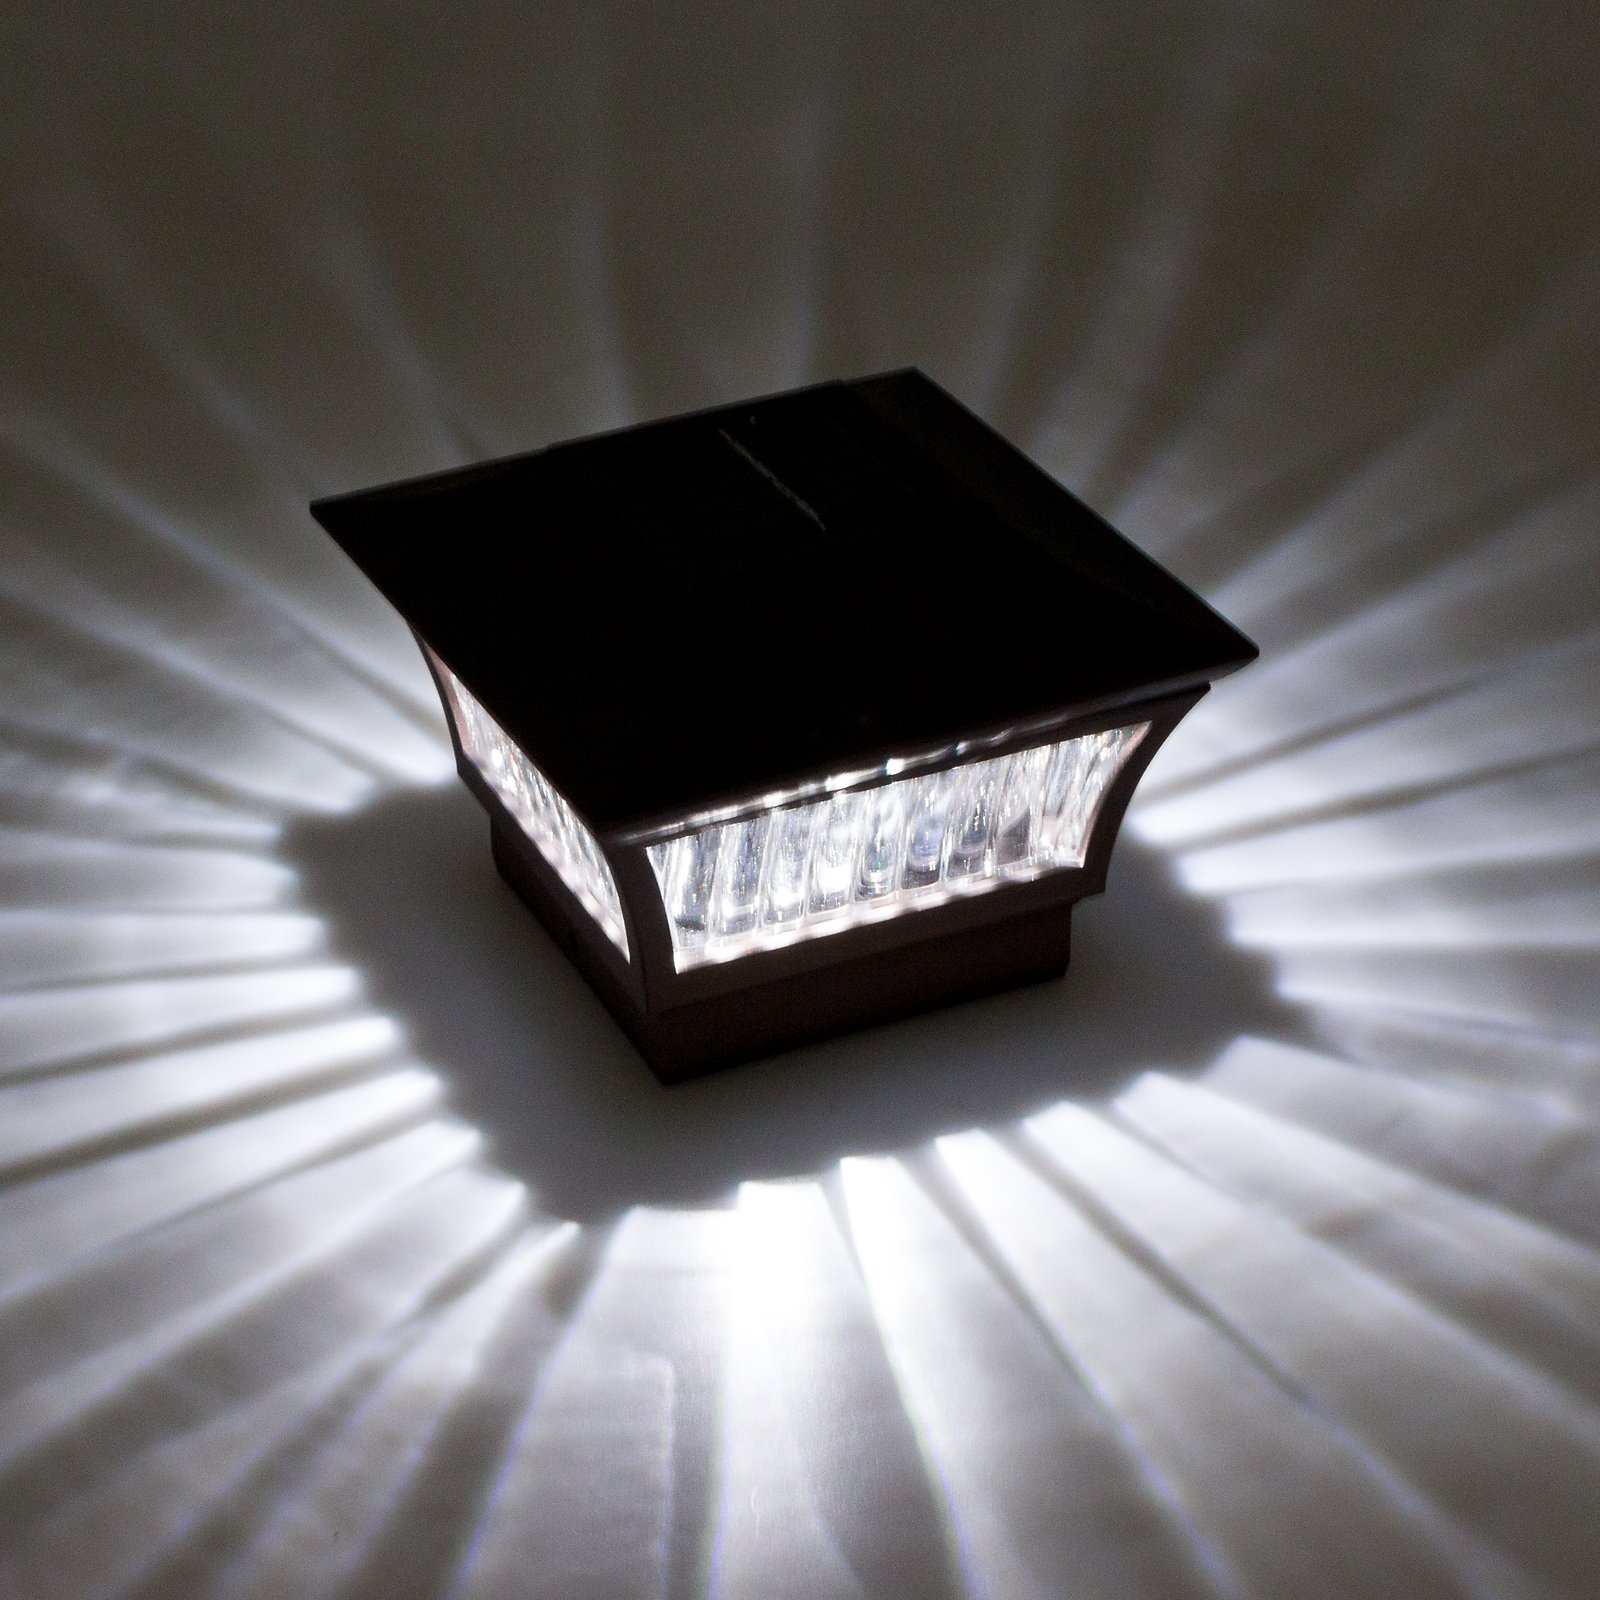 GreenLighting Bronze Aluminum Solar Post Cap Light 4x4 Wood & 6x6 PVC (2 Pack) by GreenLighting (Image #2)